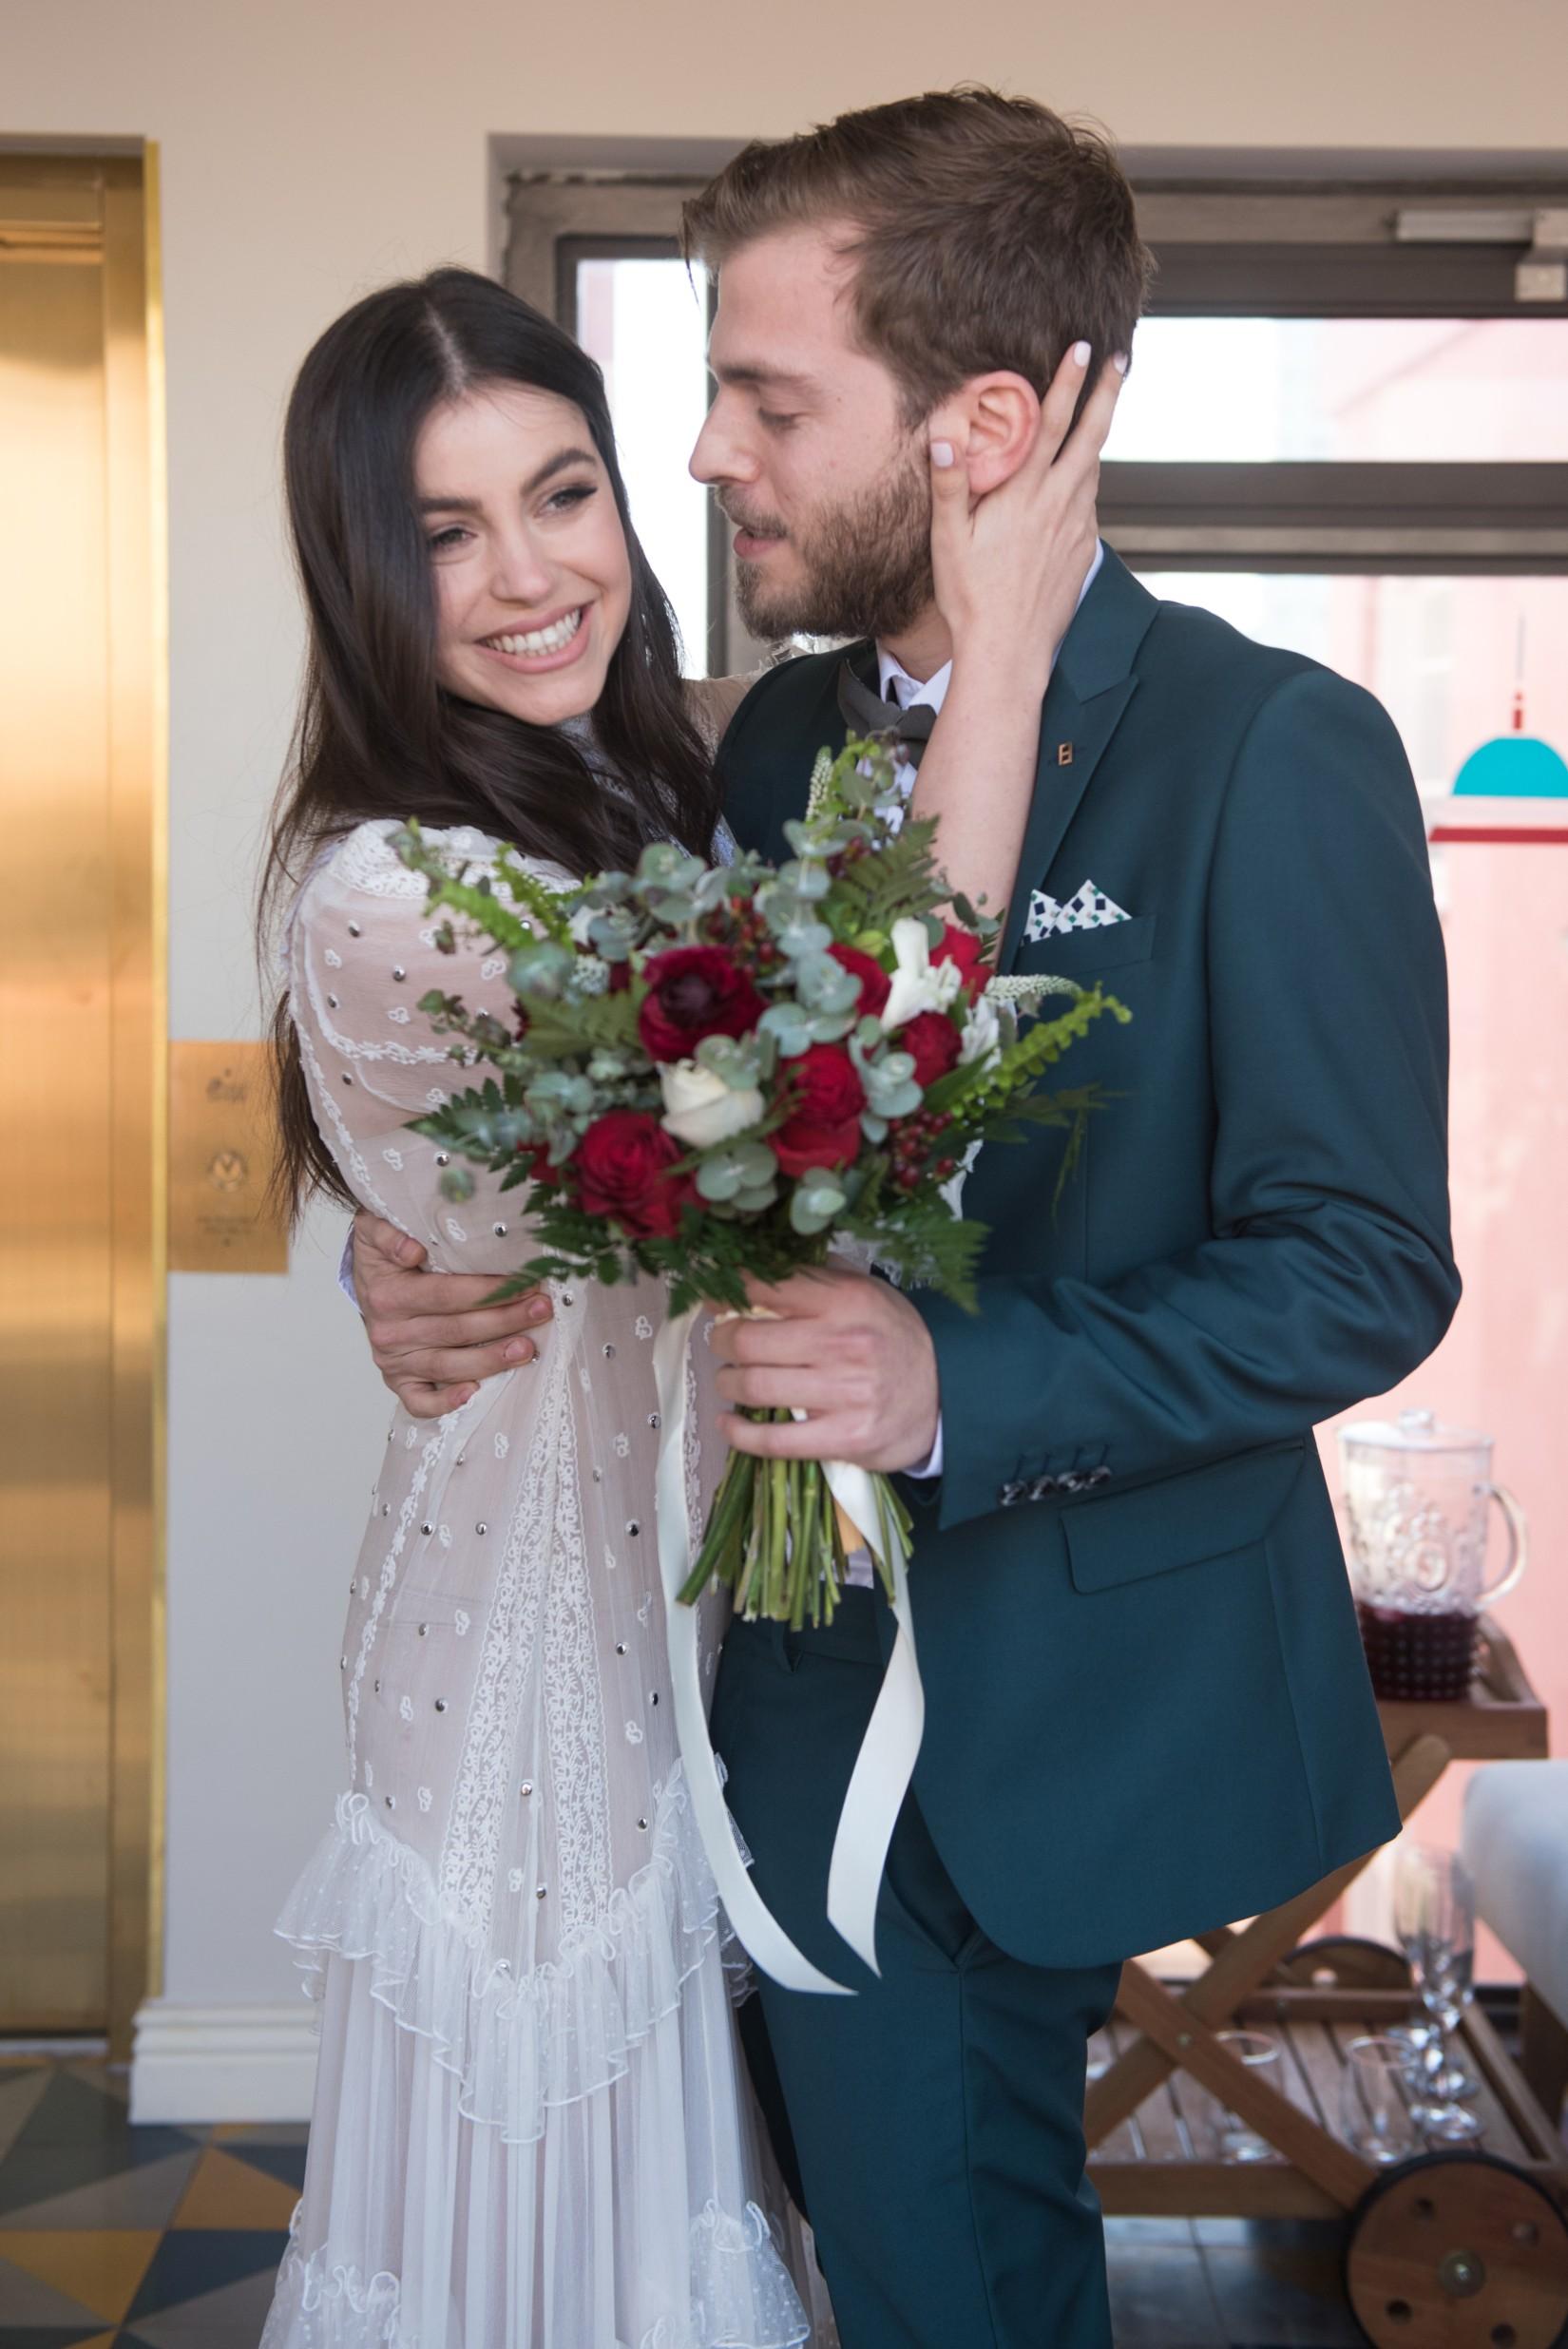 Home & Away: החתונה של תום וסער